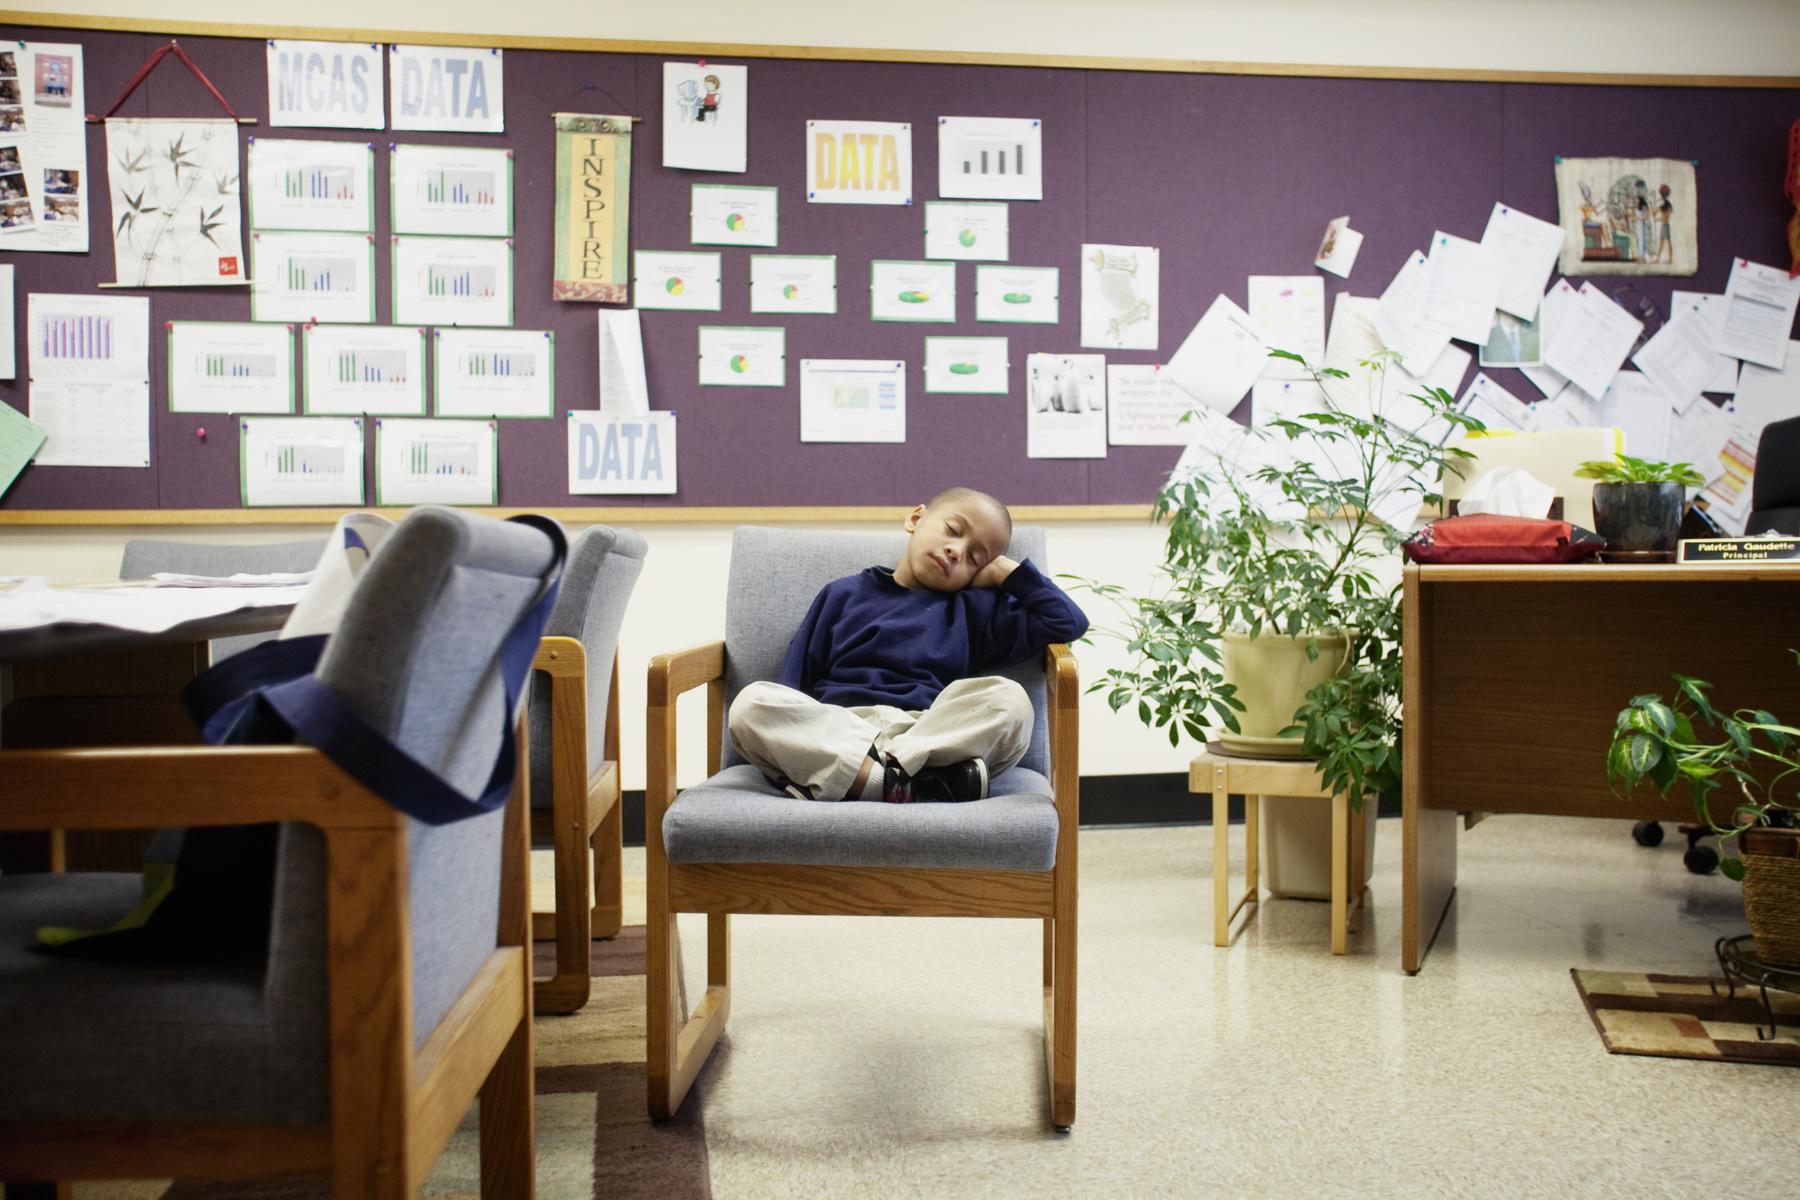 school-sleep-student-1.jpg